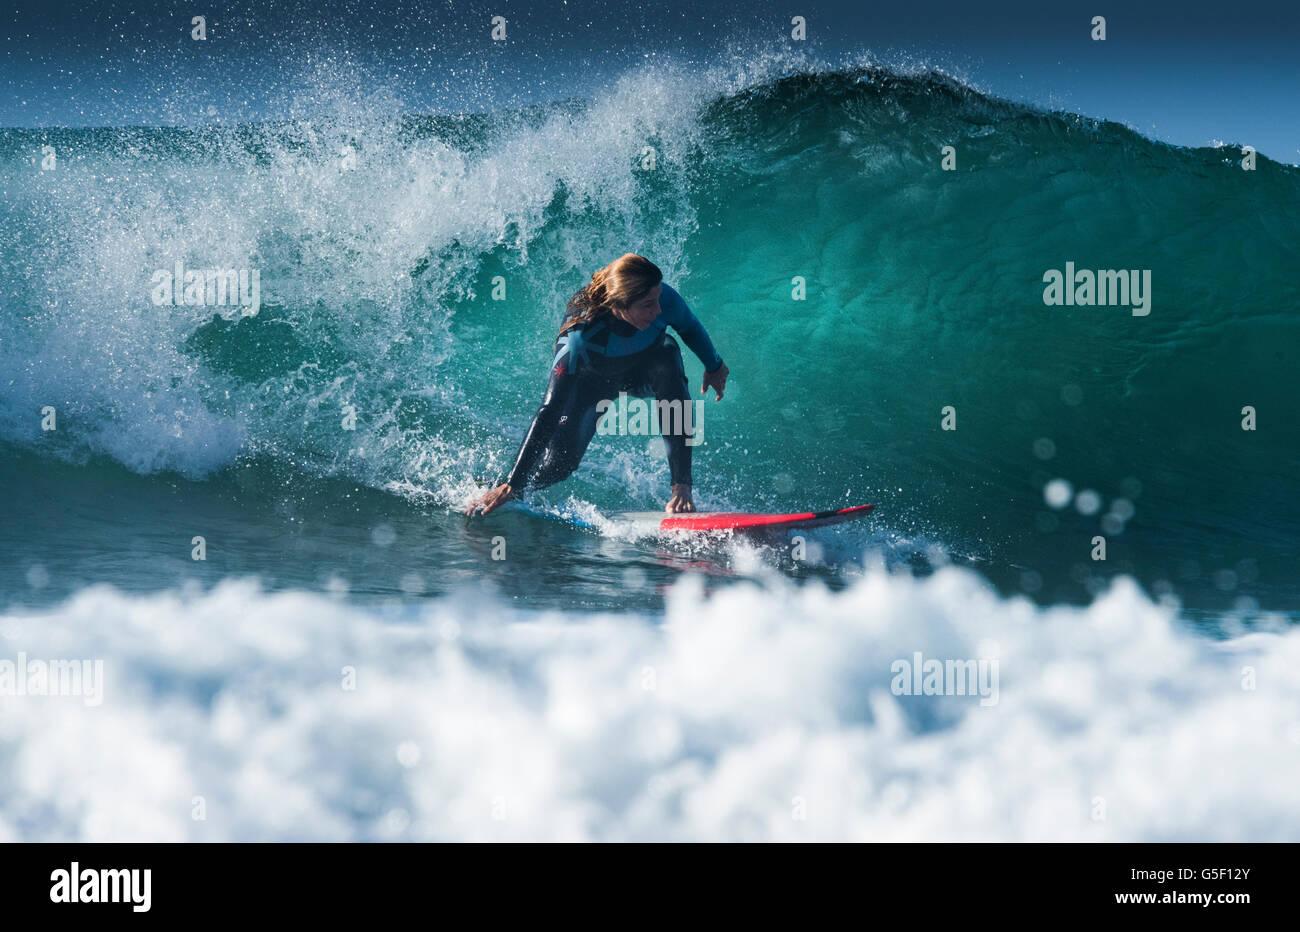 Surf El Bunker. Tarifa, Cadice, Costa de la Luz, Andalusia, Spagna. Immagini Stock